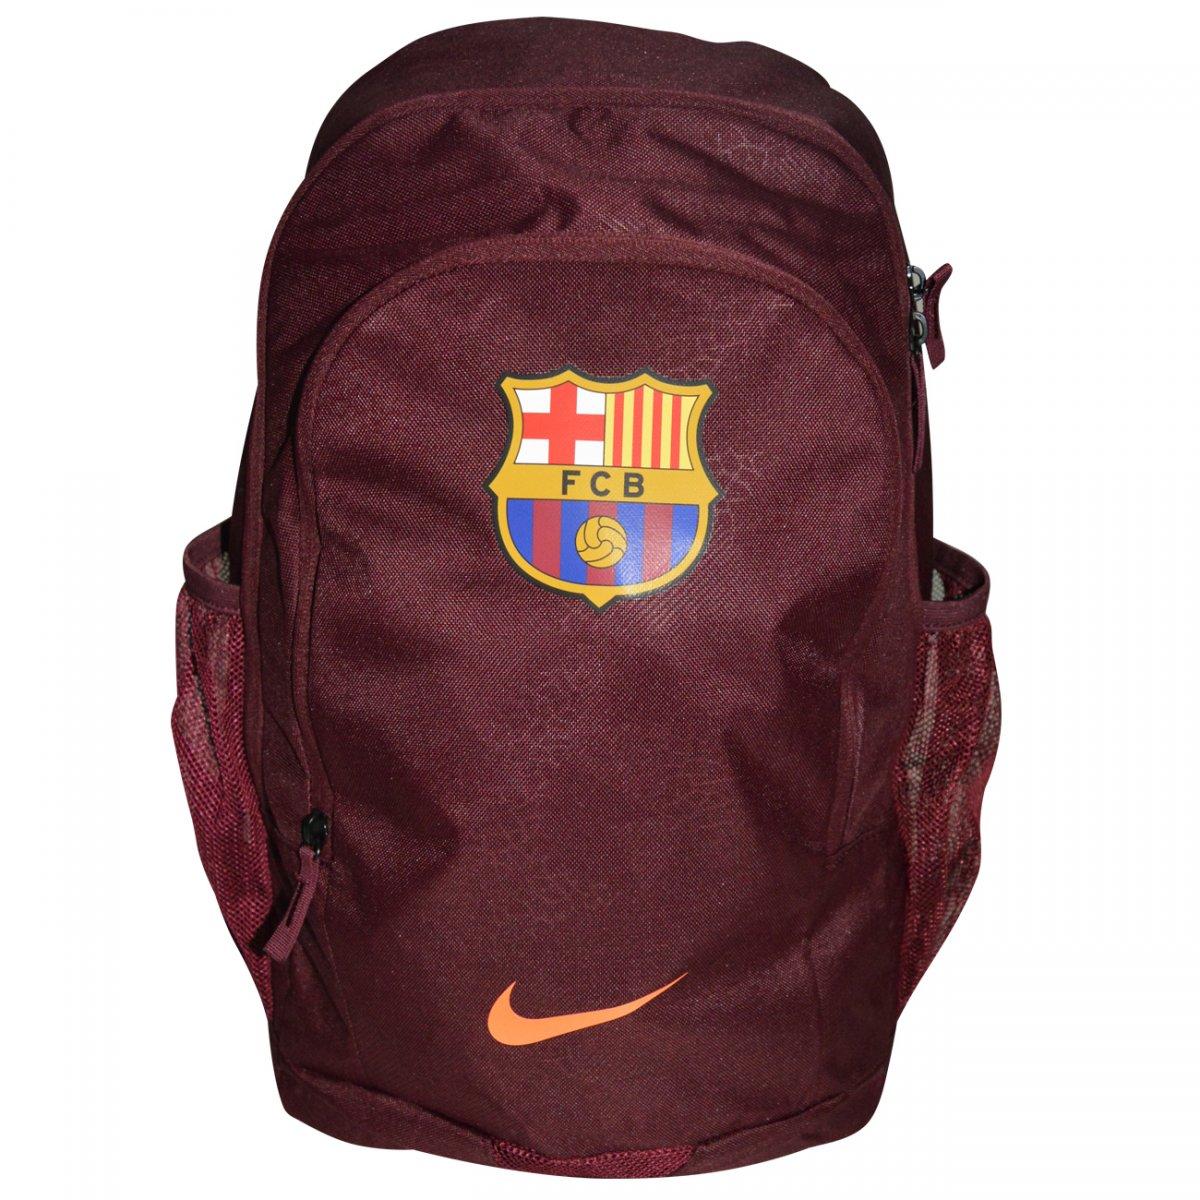 91b1bed48 Mochila Nike Barcelona BA5496 BA5496-622 - Bordô - Chuteira Nike, Adidas.  Sandalias Femininas. Sandy Calçados